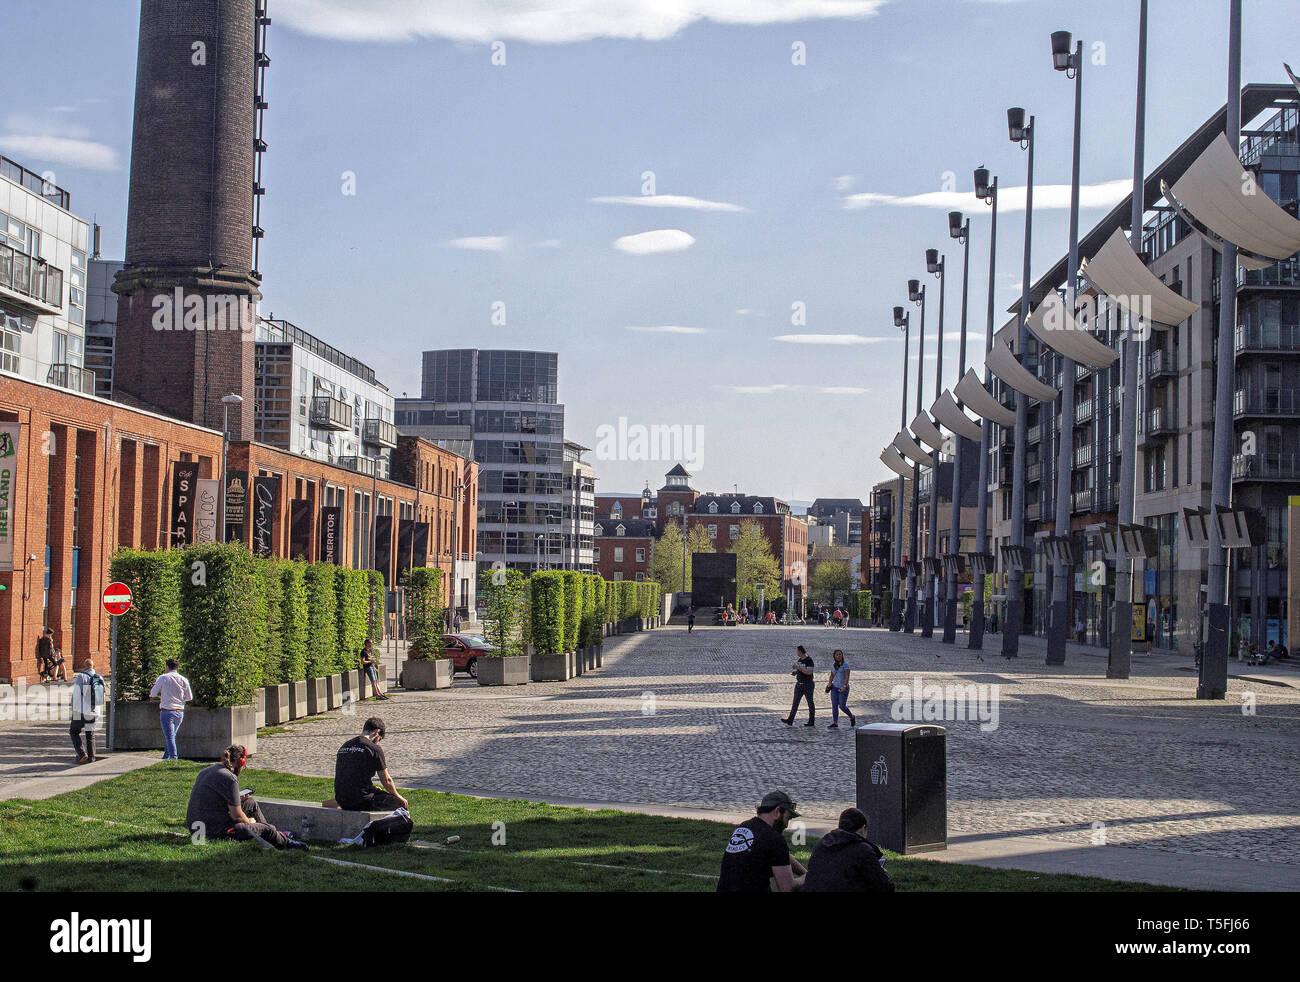 6b2bc5ff4eae4 Smithfield Square near Dublin City Centre, ireland. Following redevelopment  the square hosts a major